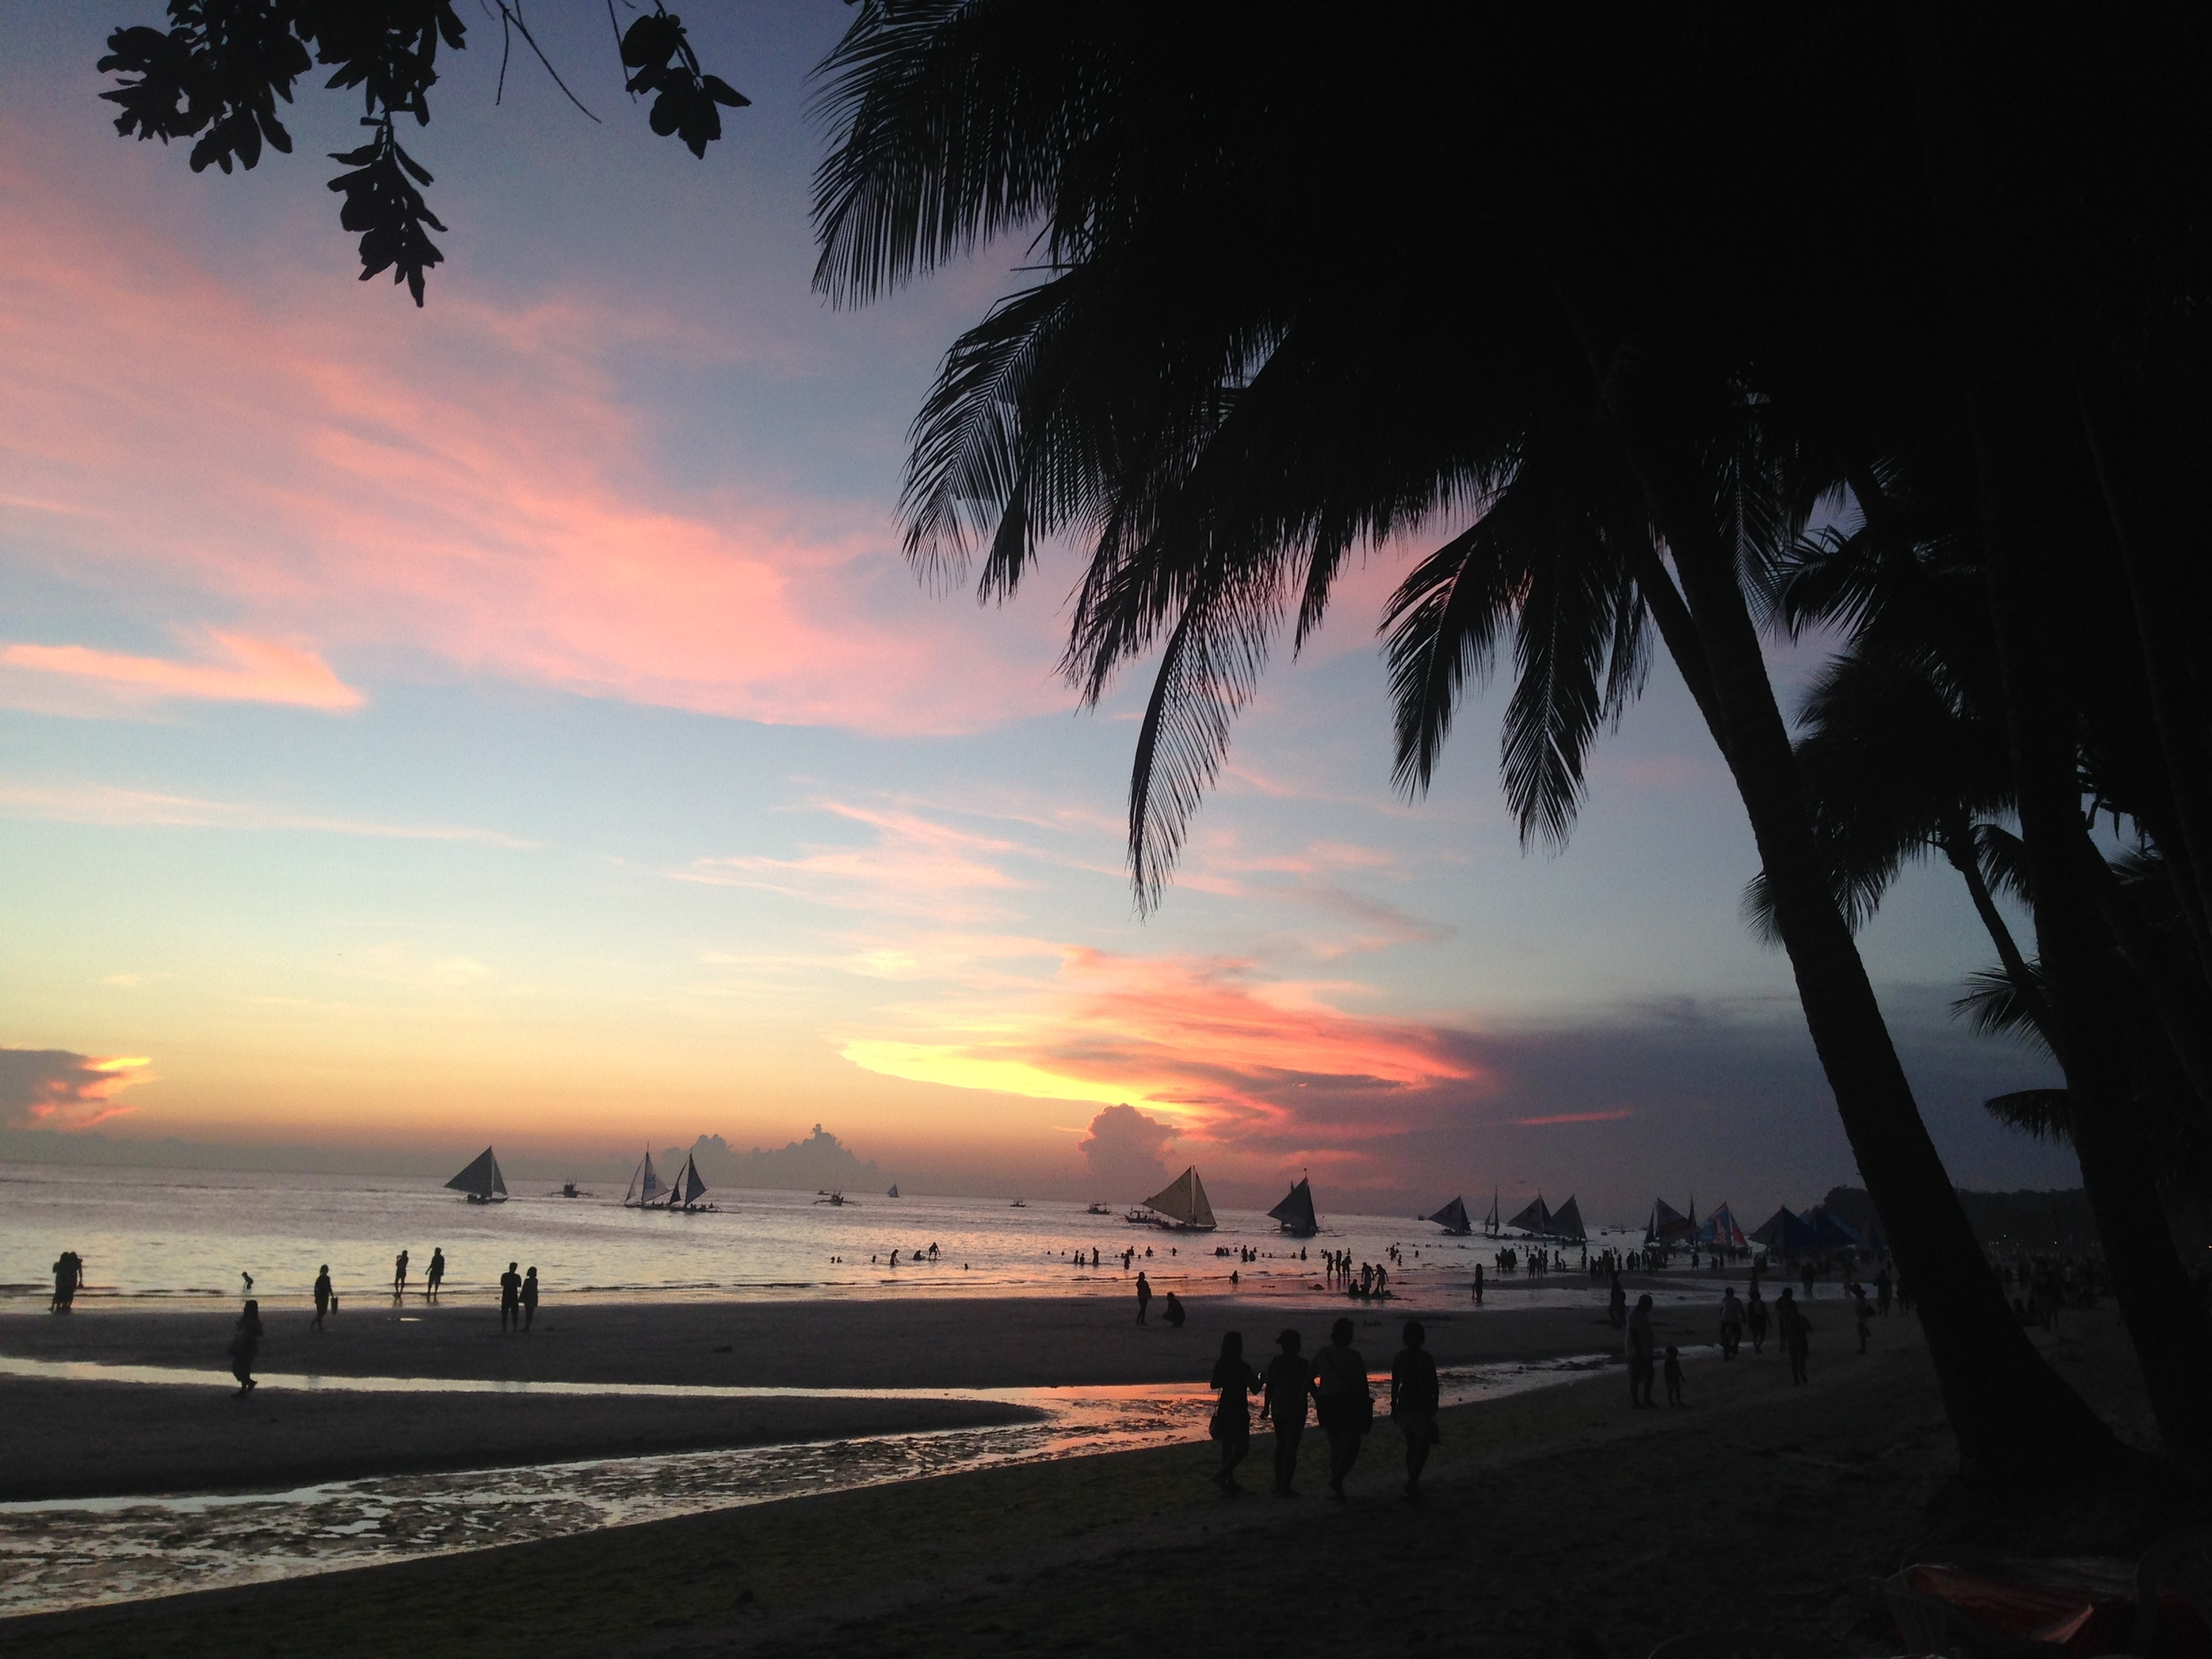 Philippines - Boracay Sunset, Palm Trees, Pastel Colours, Shoreline, Yachts